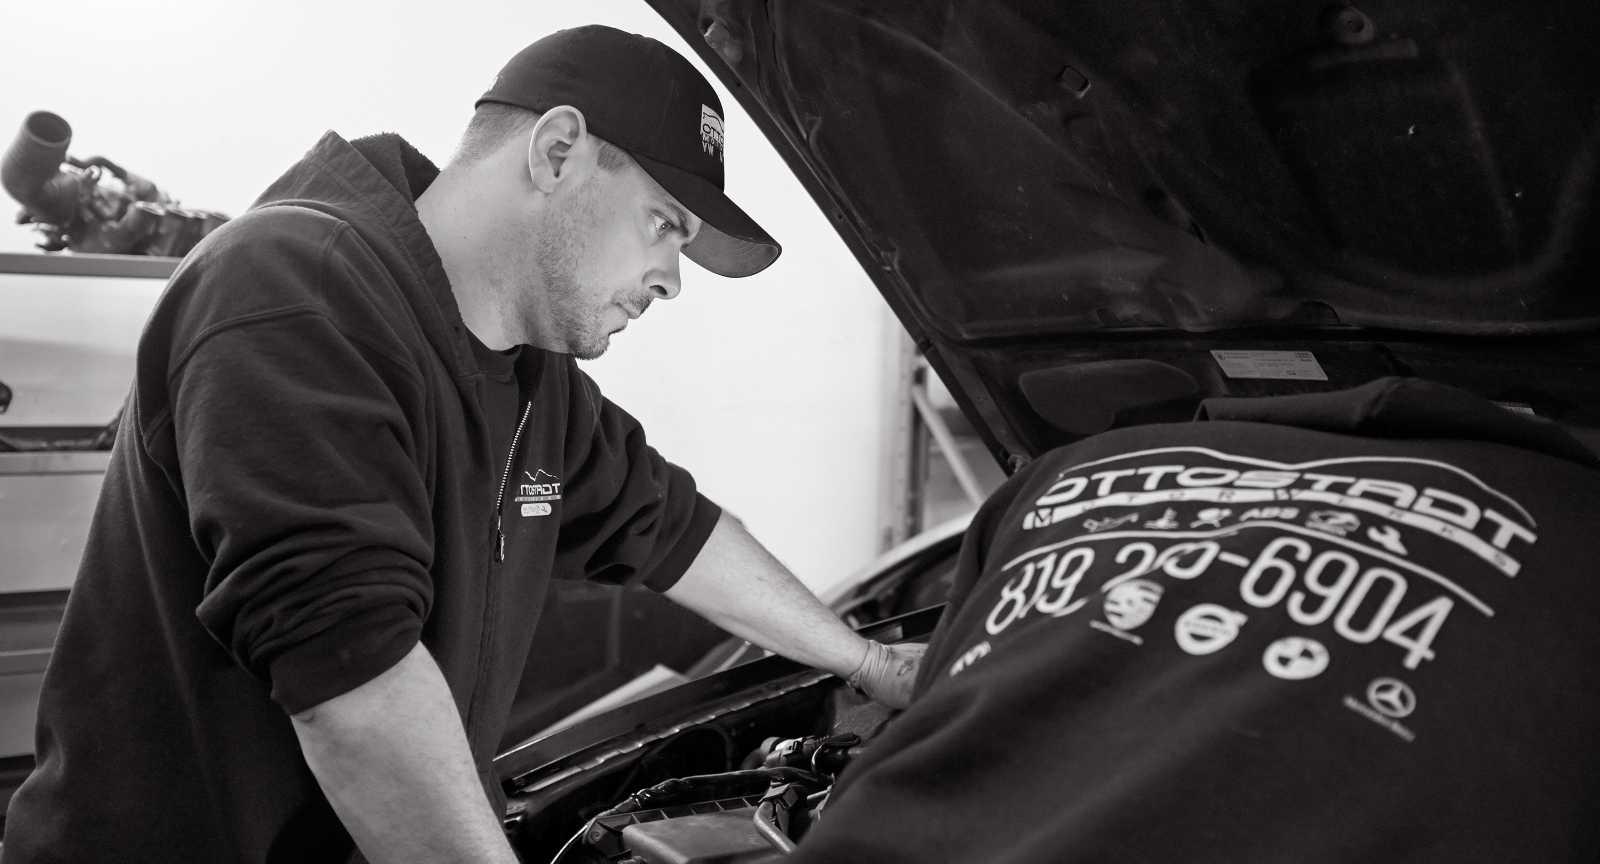 OttoStadt MotorWerks is the preferred shop for Audi, BMW, Mini, Mercedes, Porsche and Volkswagen